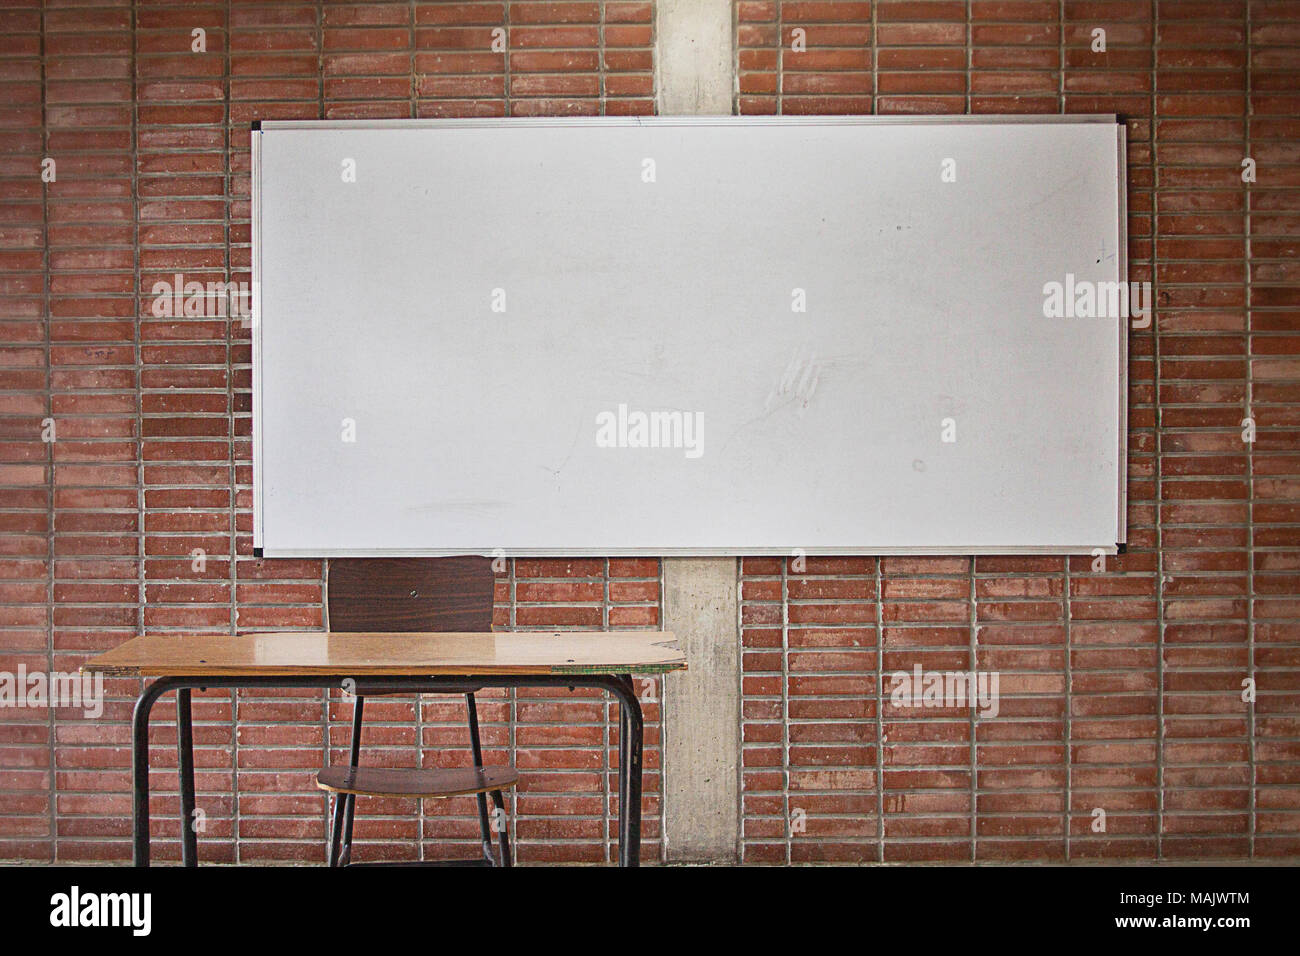 Empty Teachers Desk With Whiteboard In The Background No Teacher